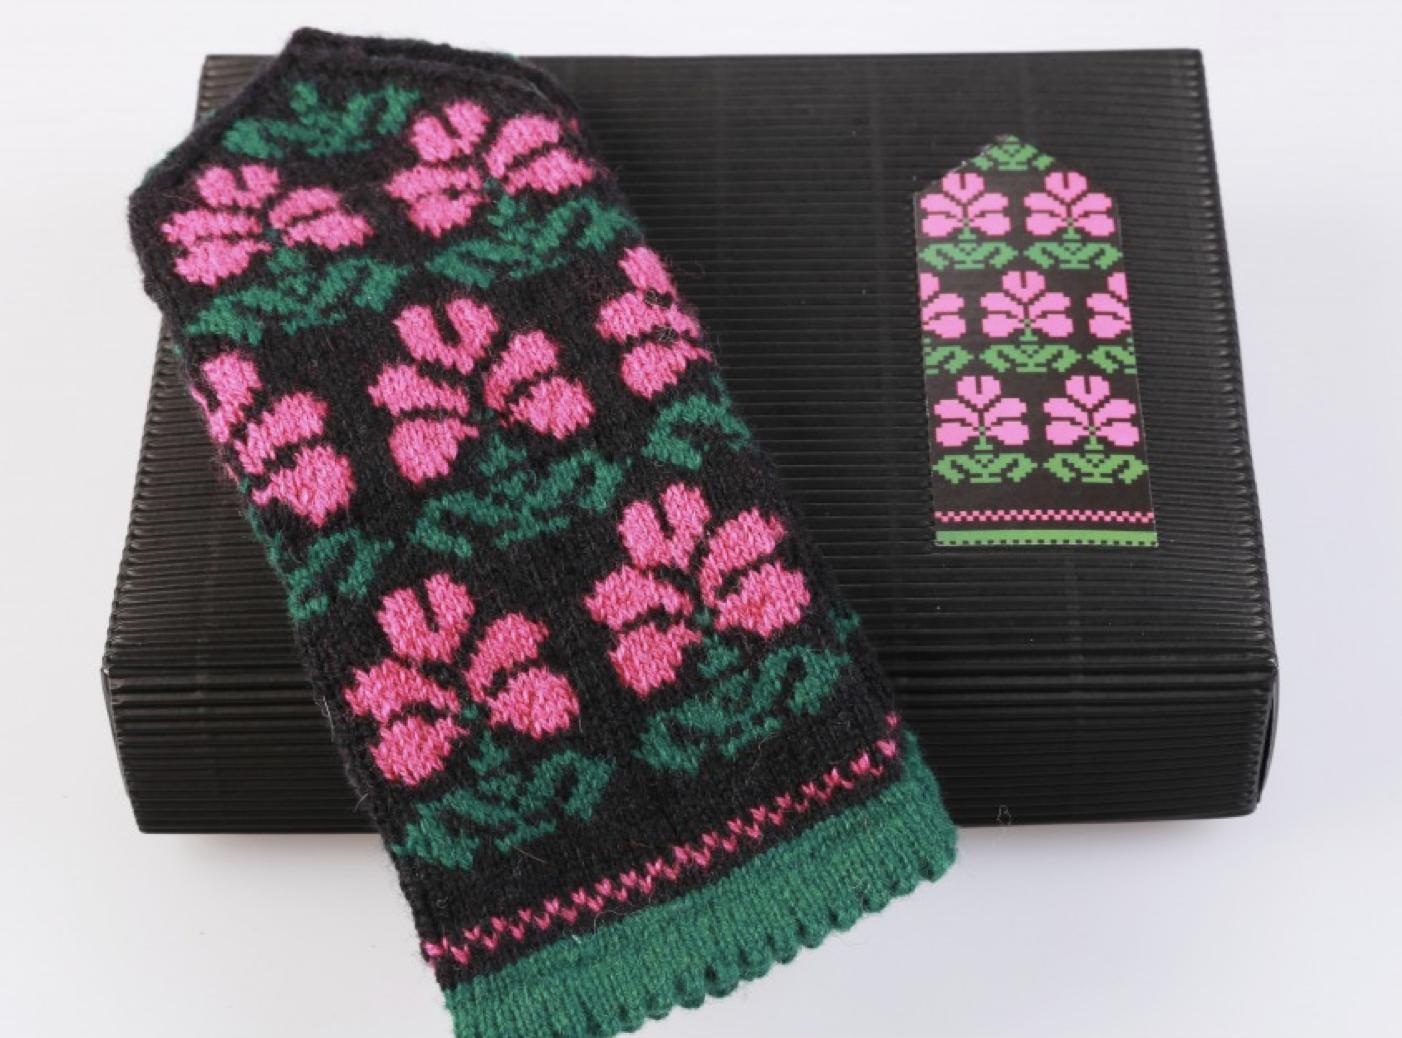 "Hobbywool Mittens Knitting Kit ""Winter Flowers"" No.2"